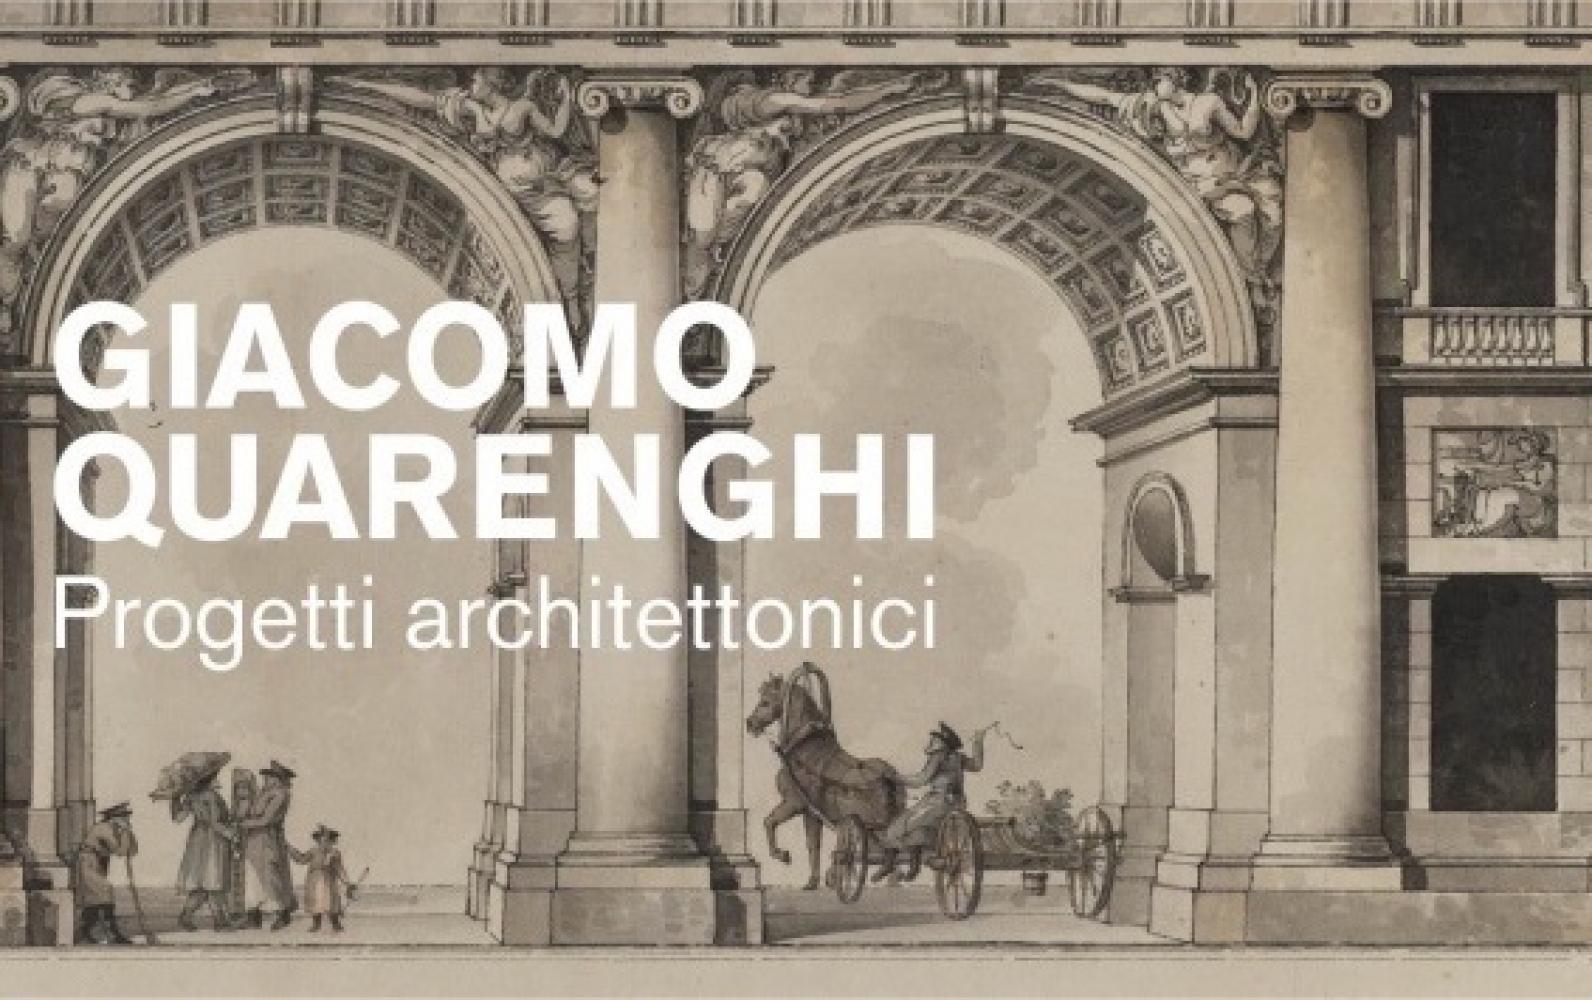 Giacomo Quarenghi. Progetti architettonici